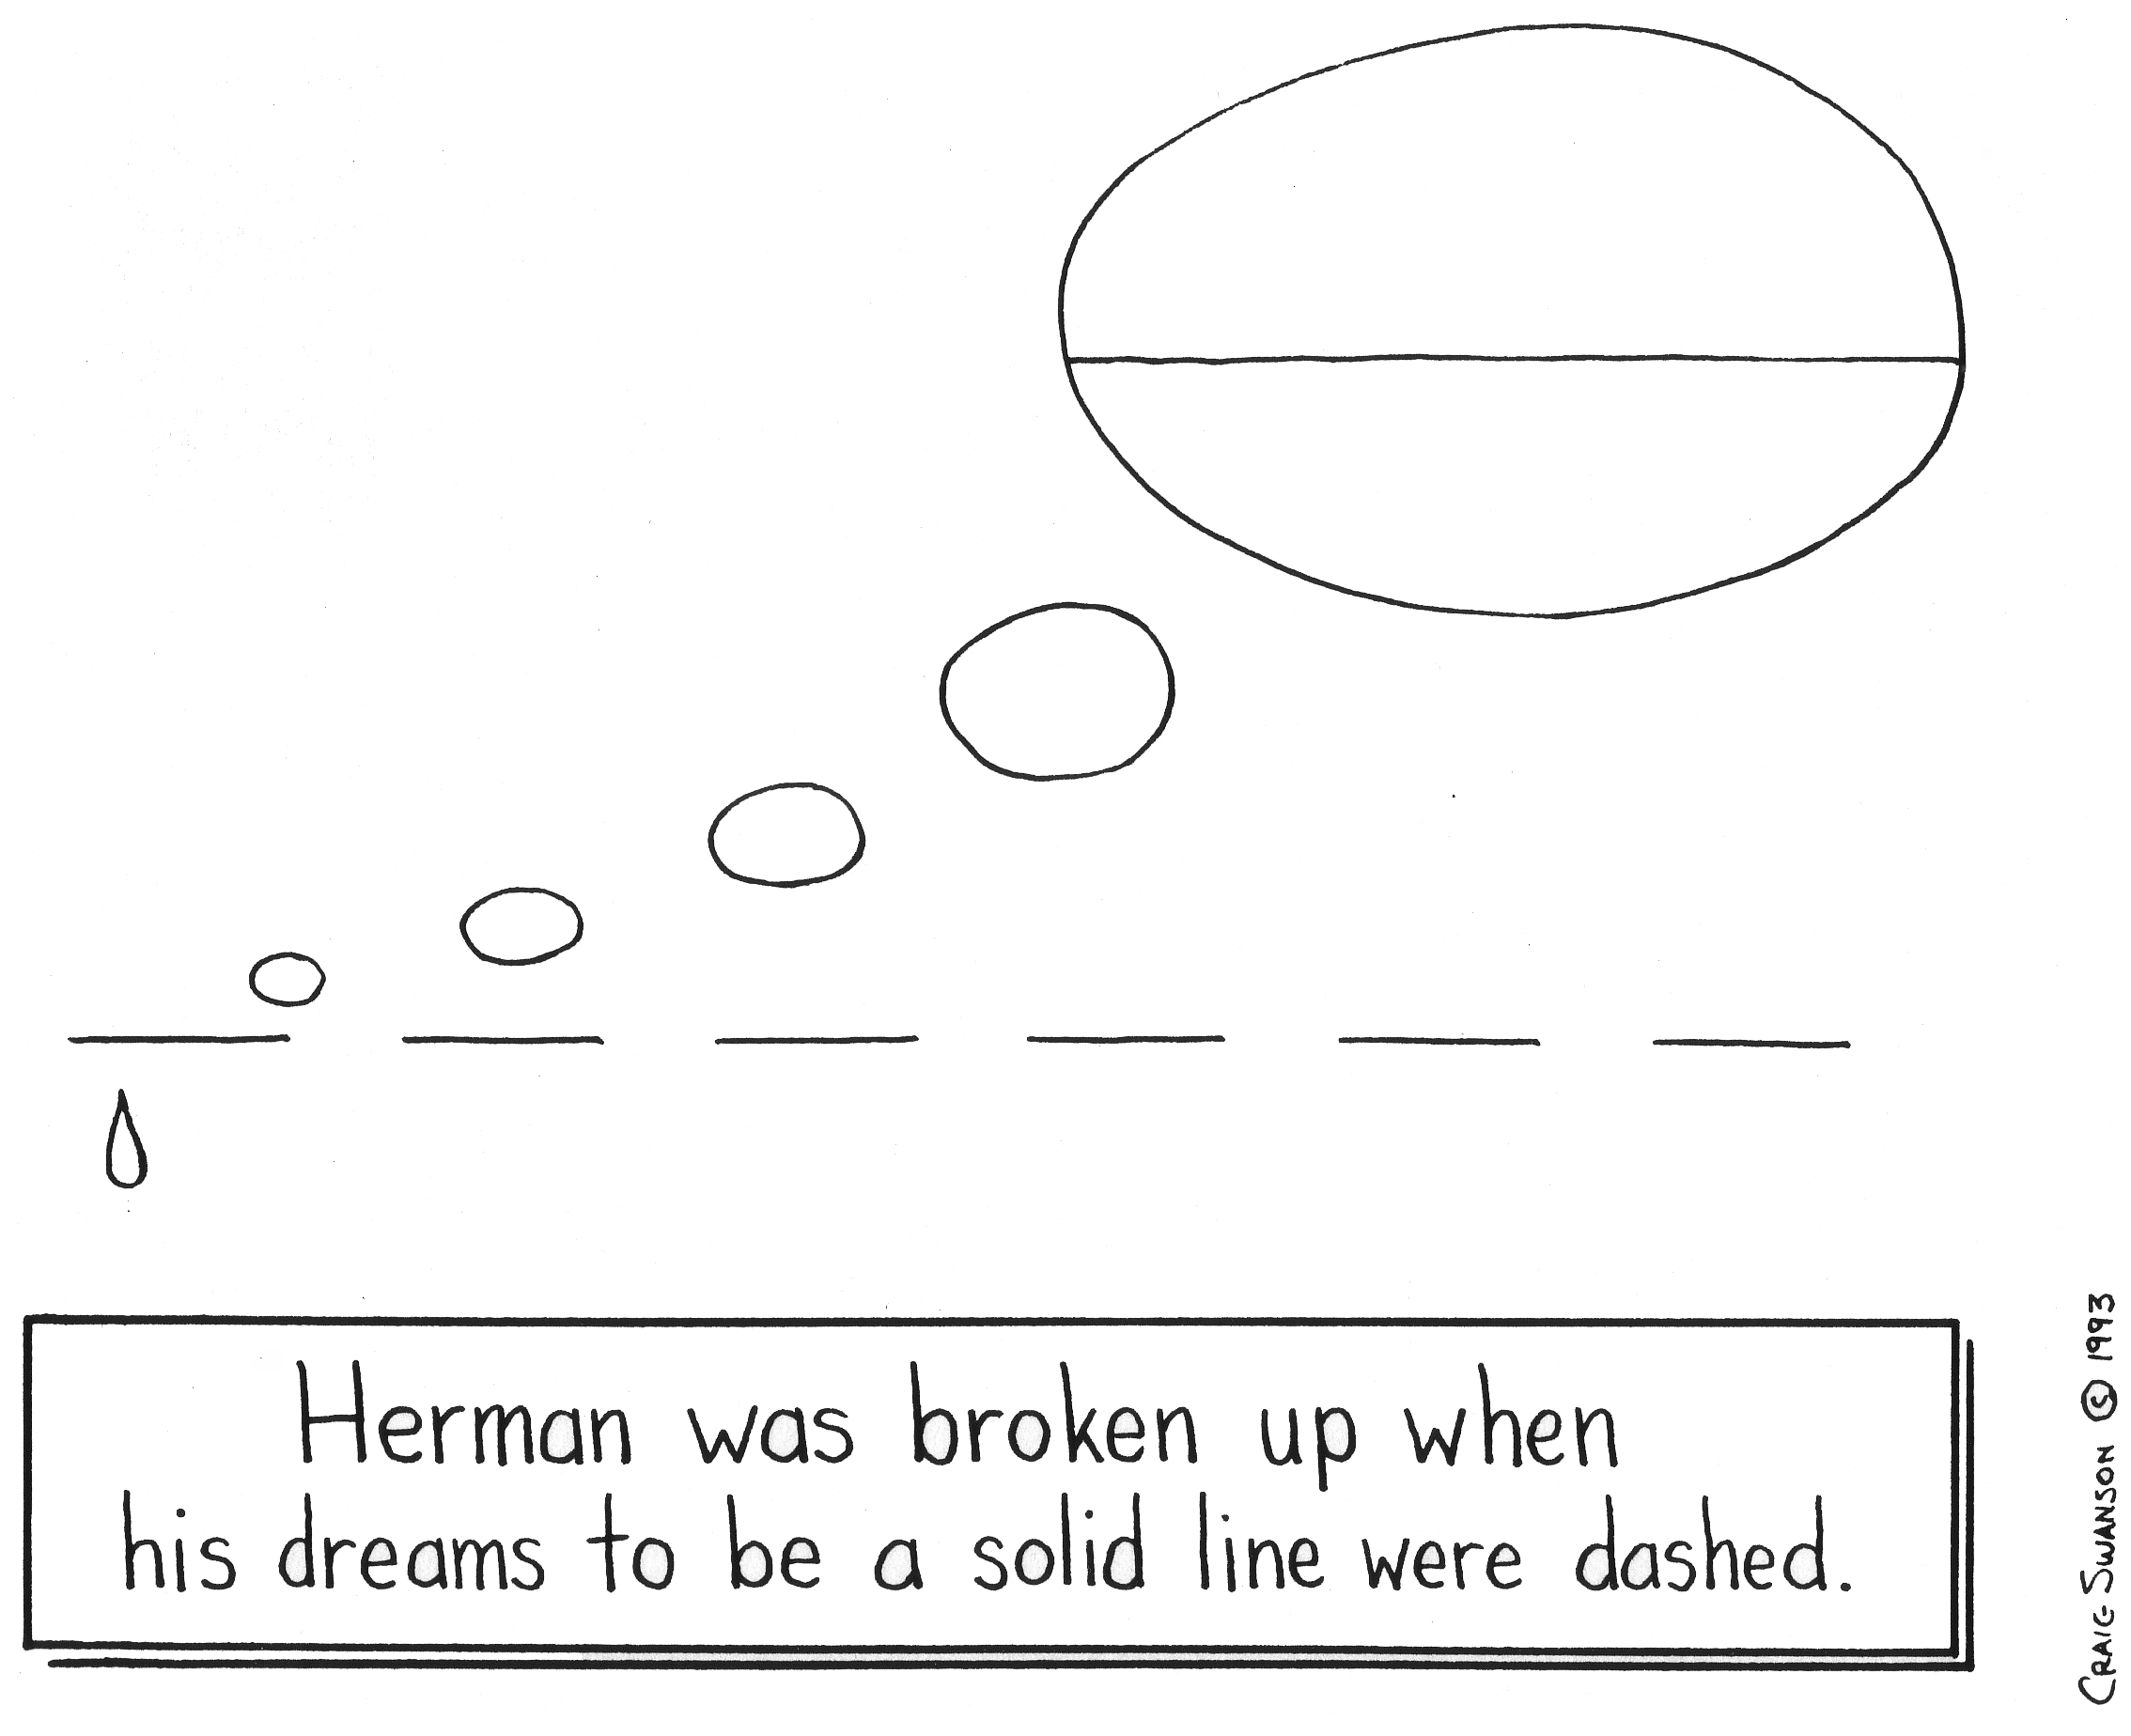 Herman the Line